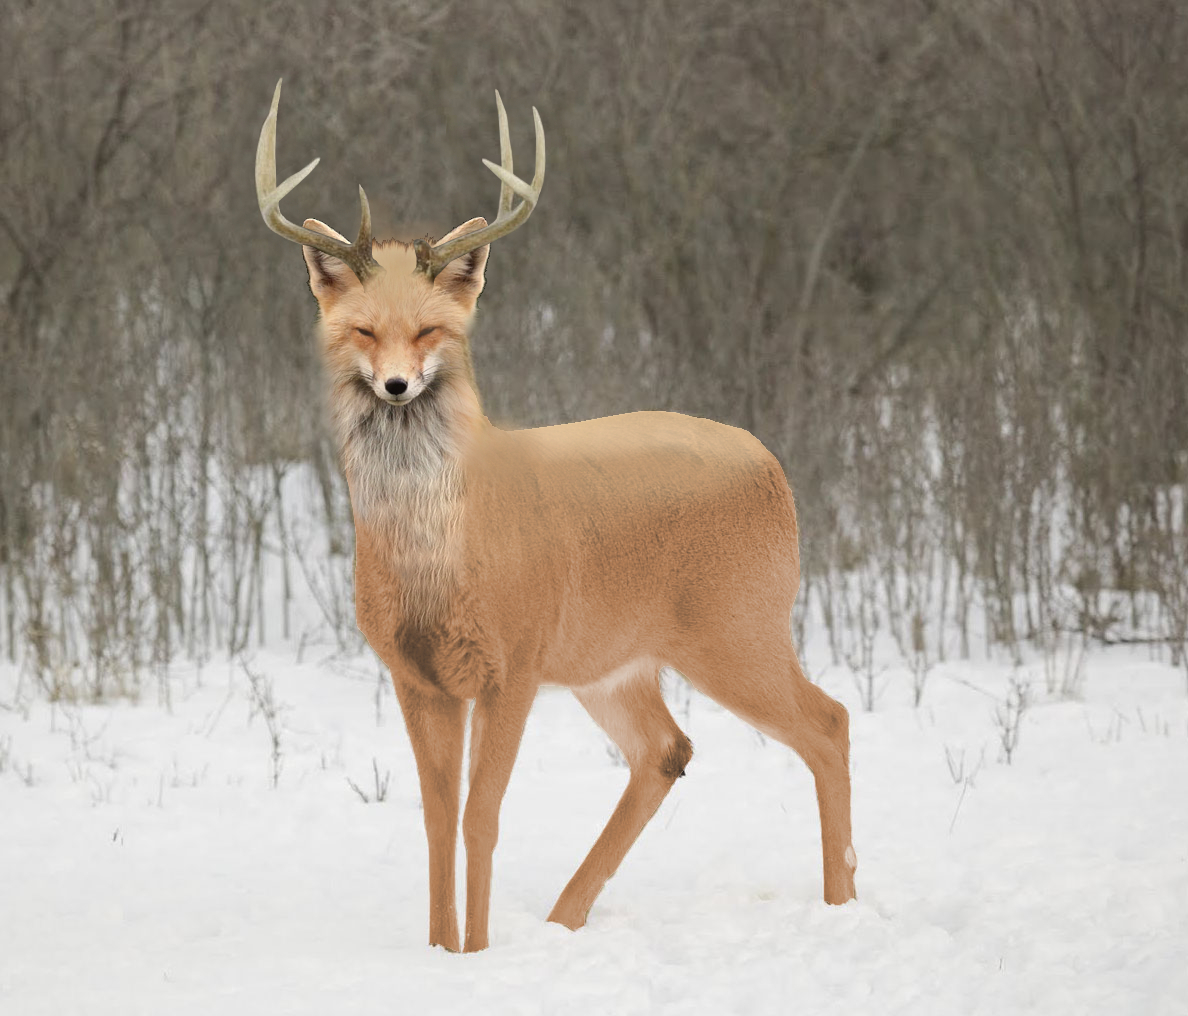 Deerfox